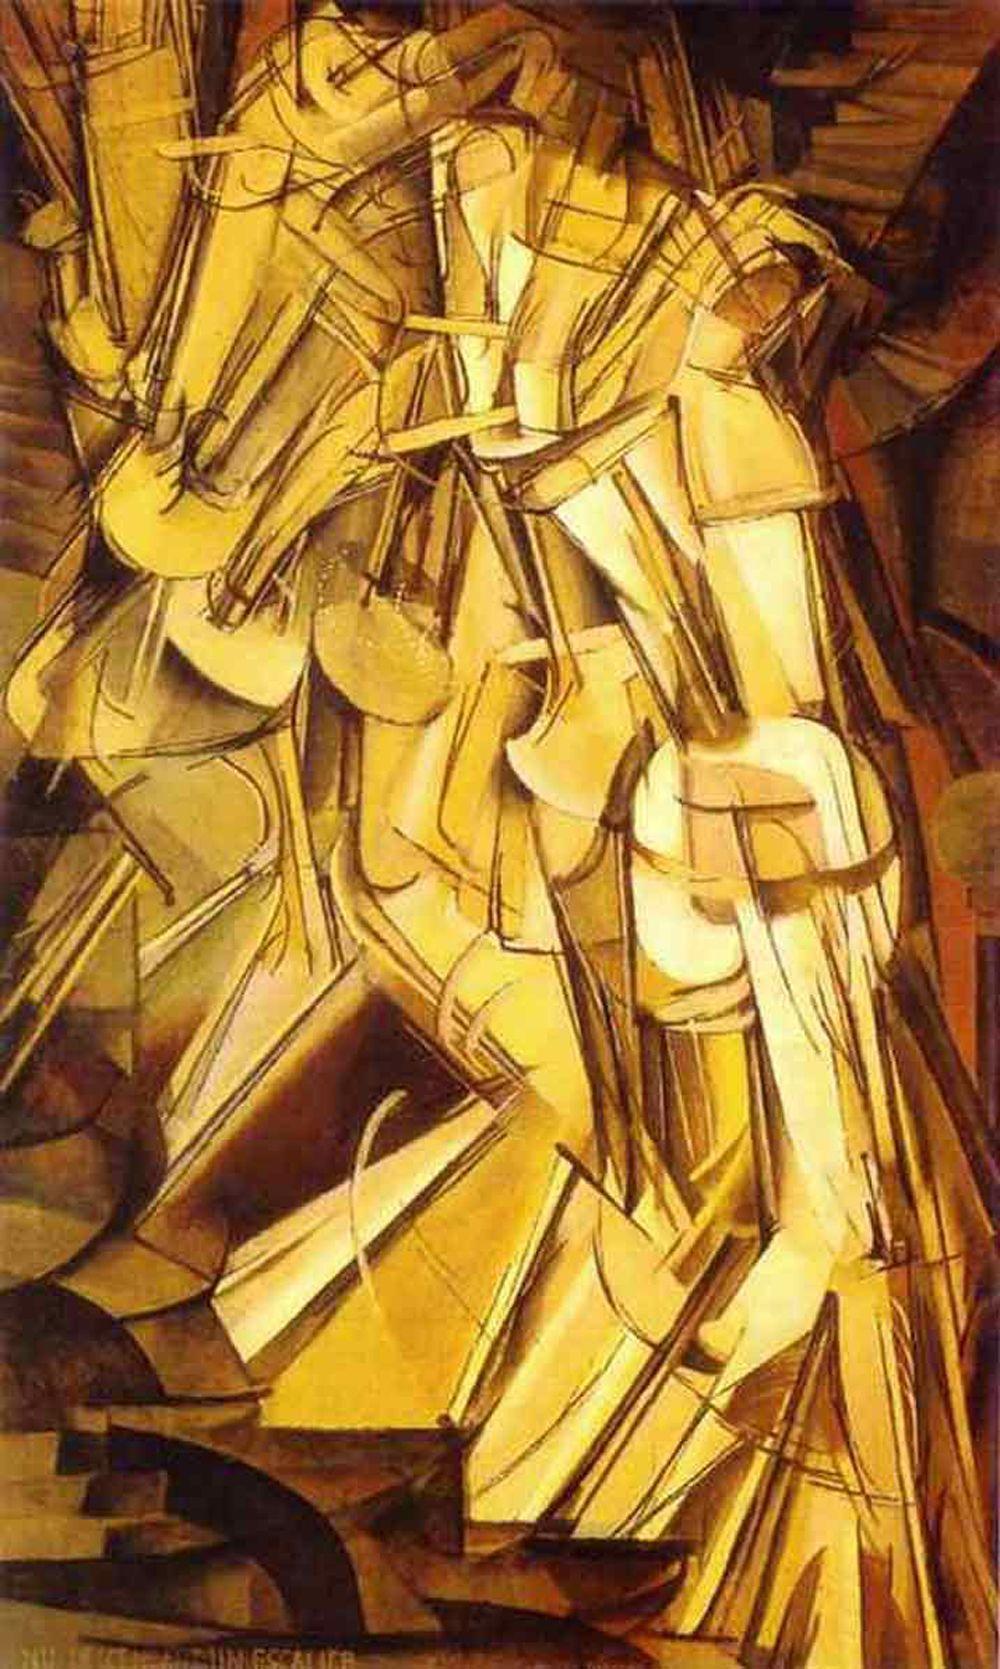 1000x1669 bức tranh Duchamp